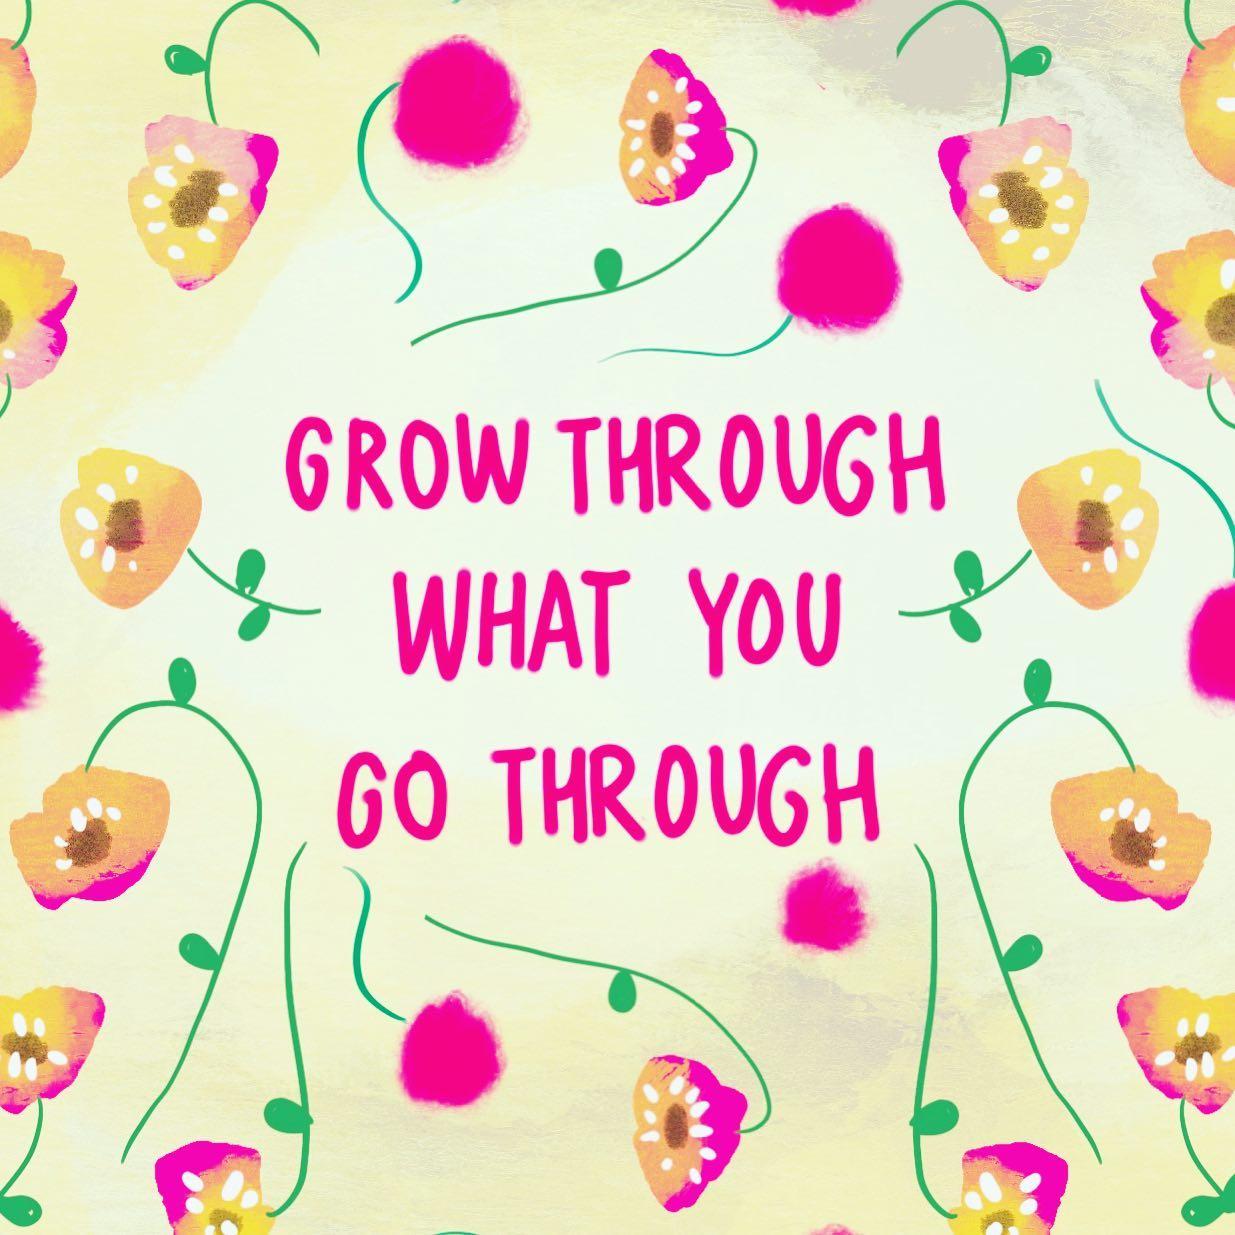 Grow through what you go through...